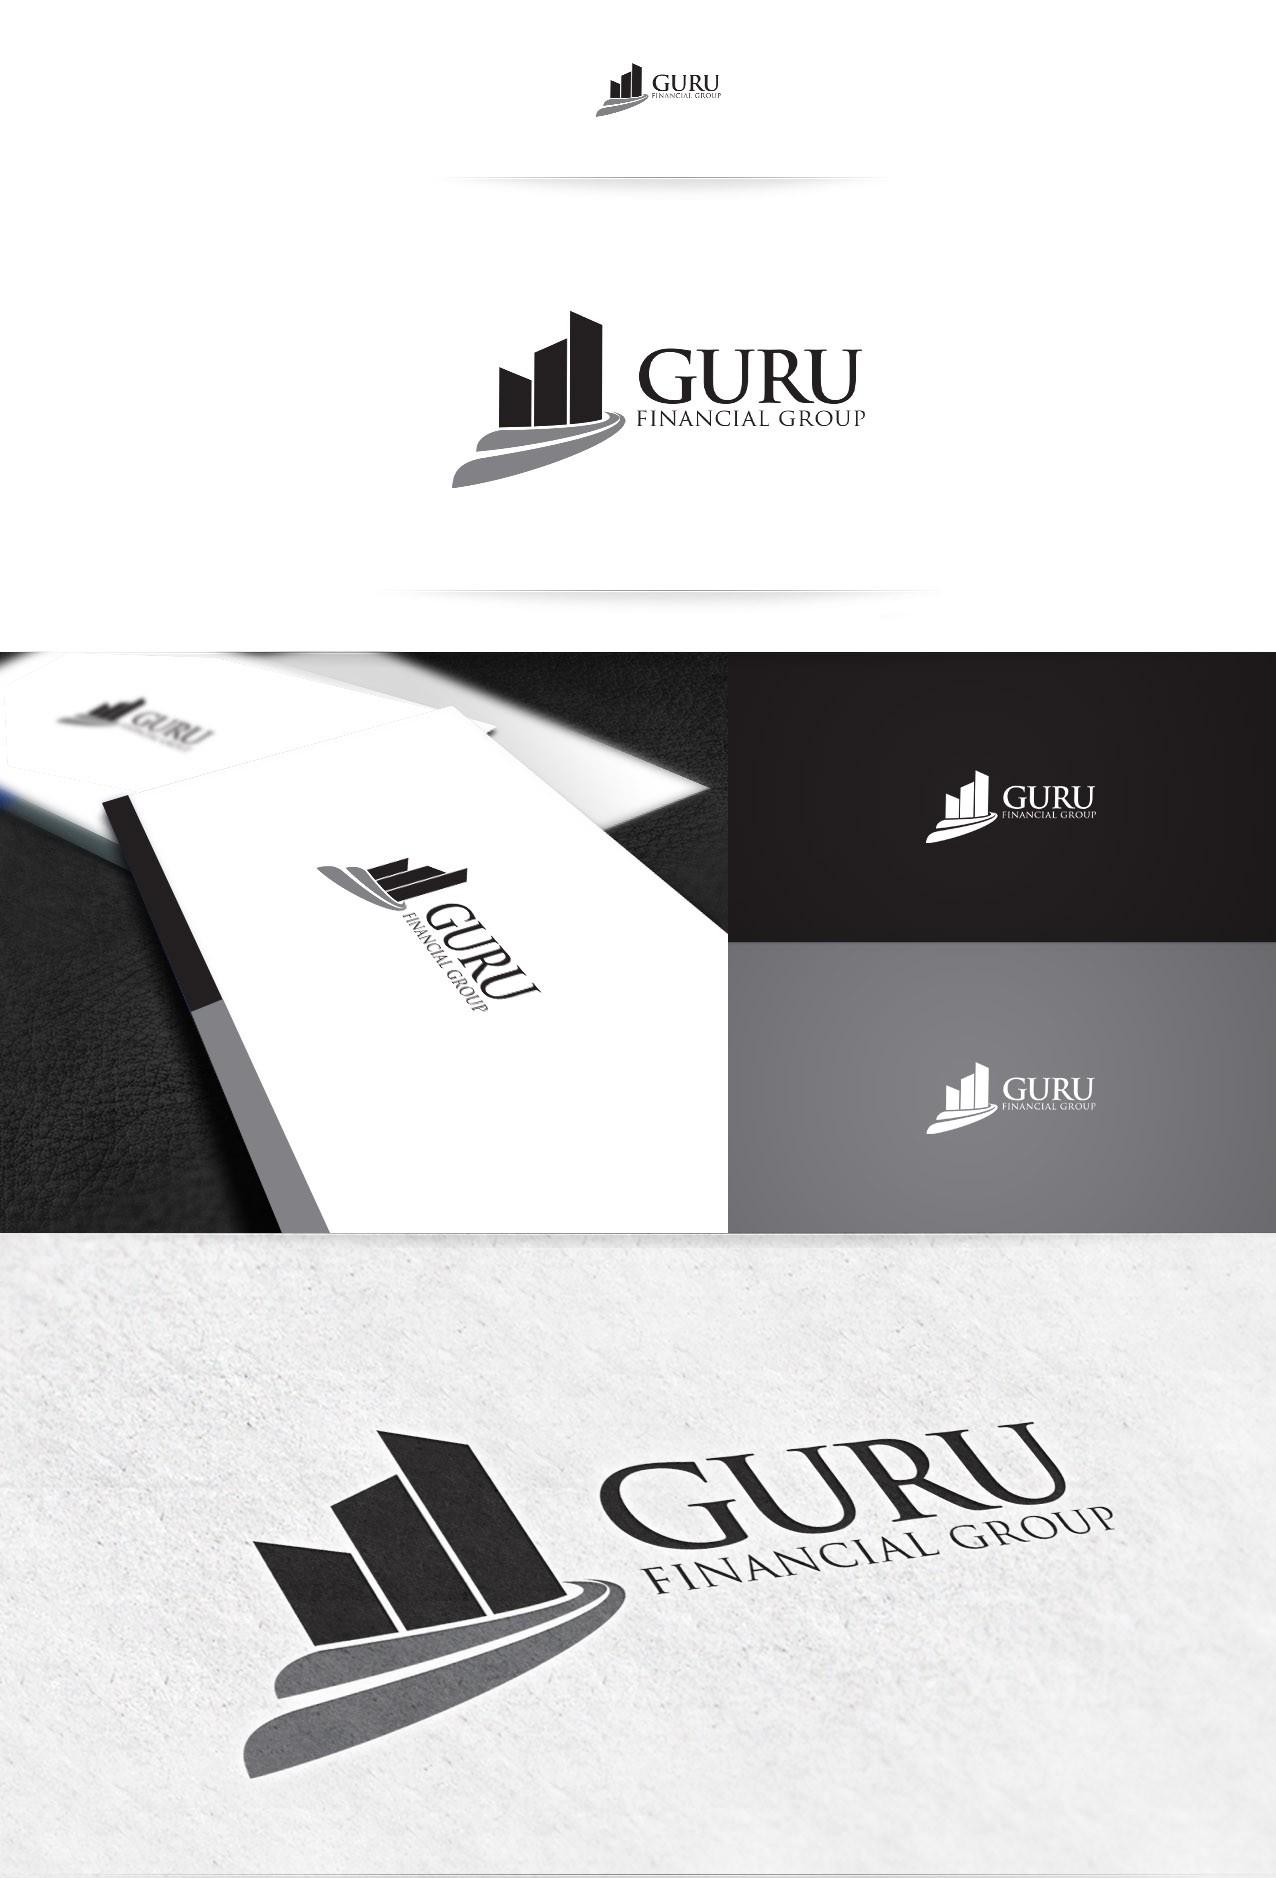 Guru Financial Group needs a new logo and business card